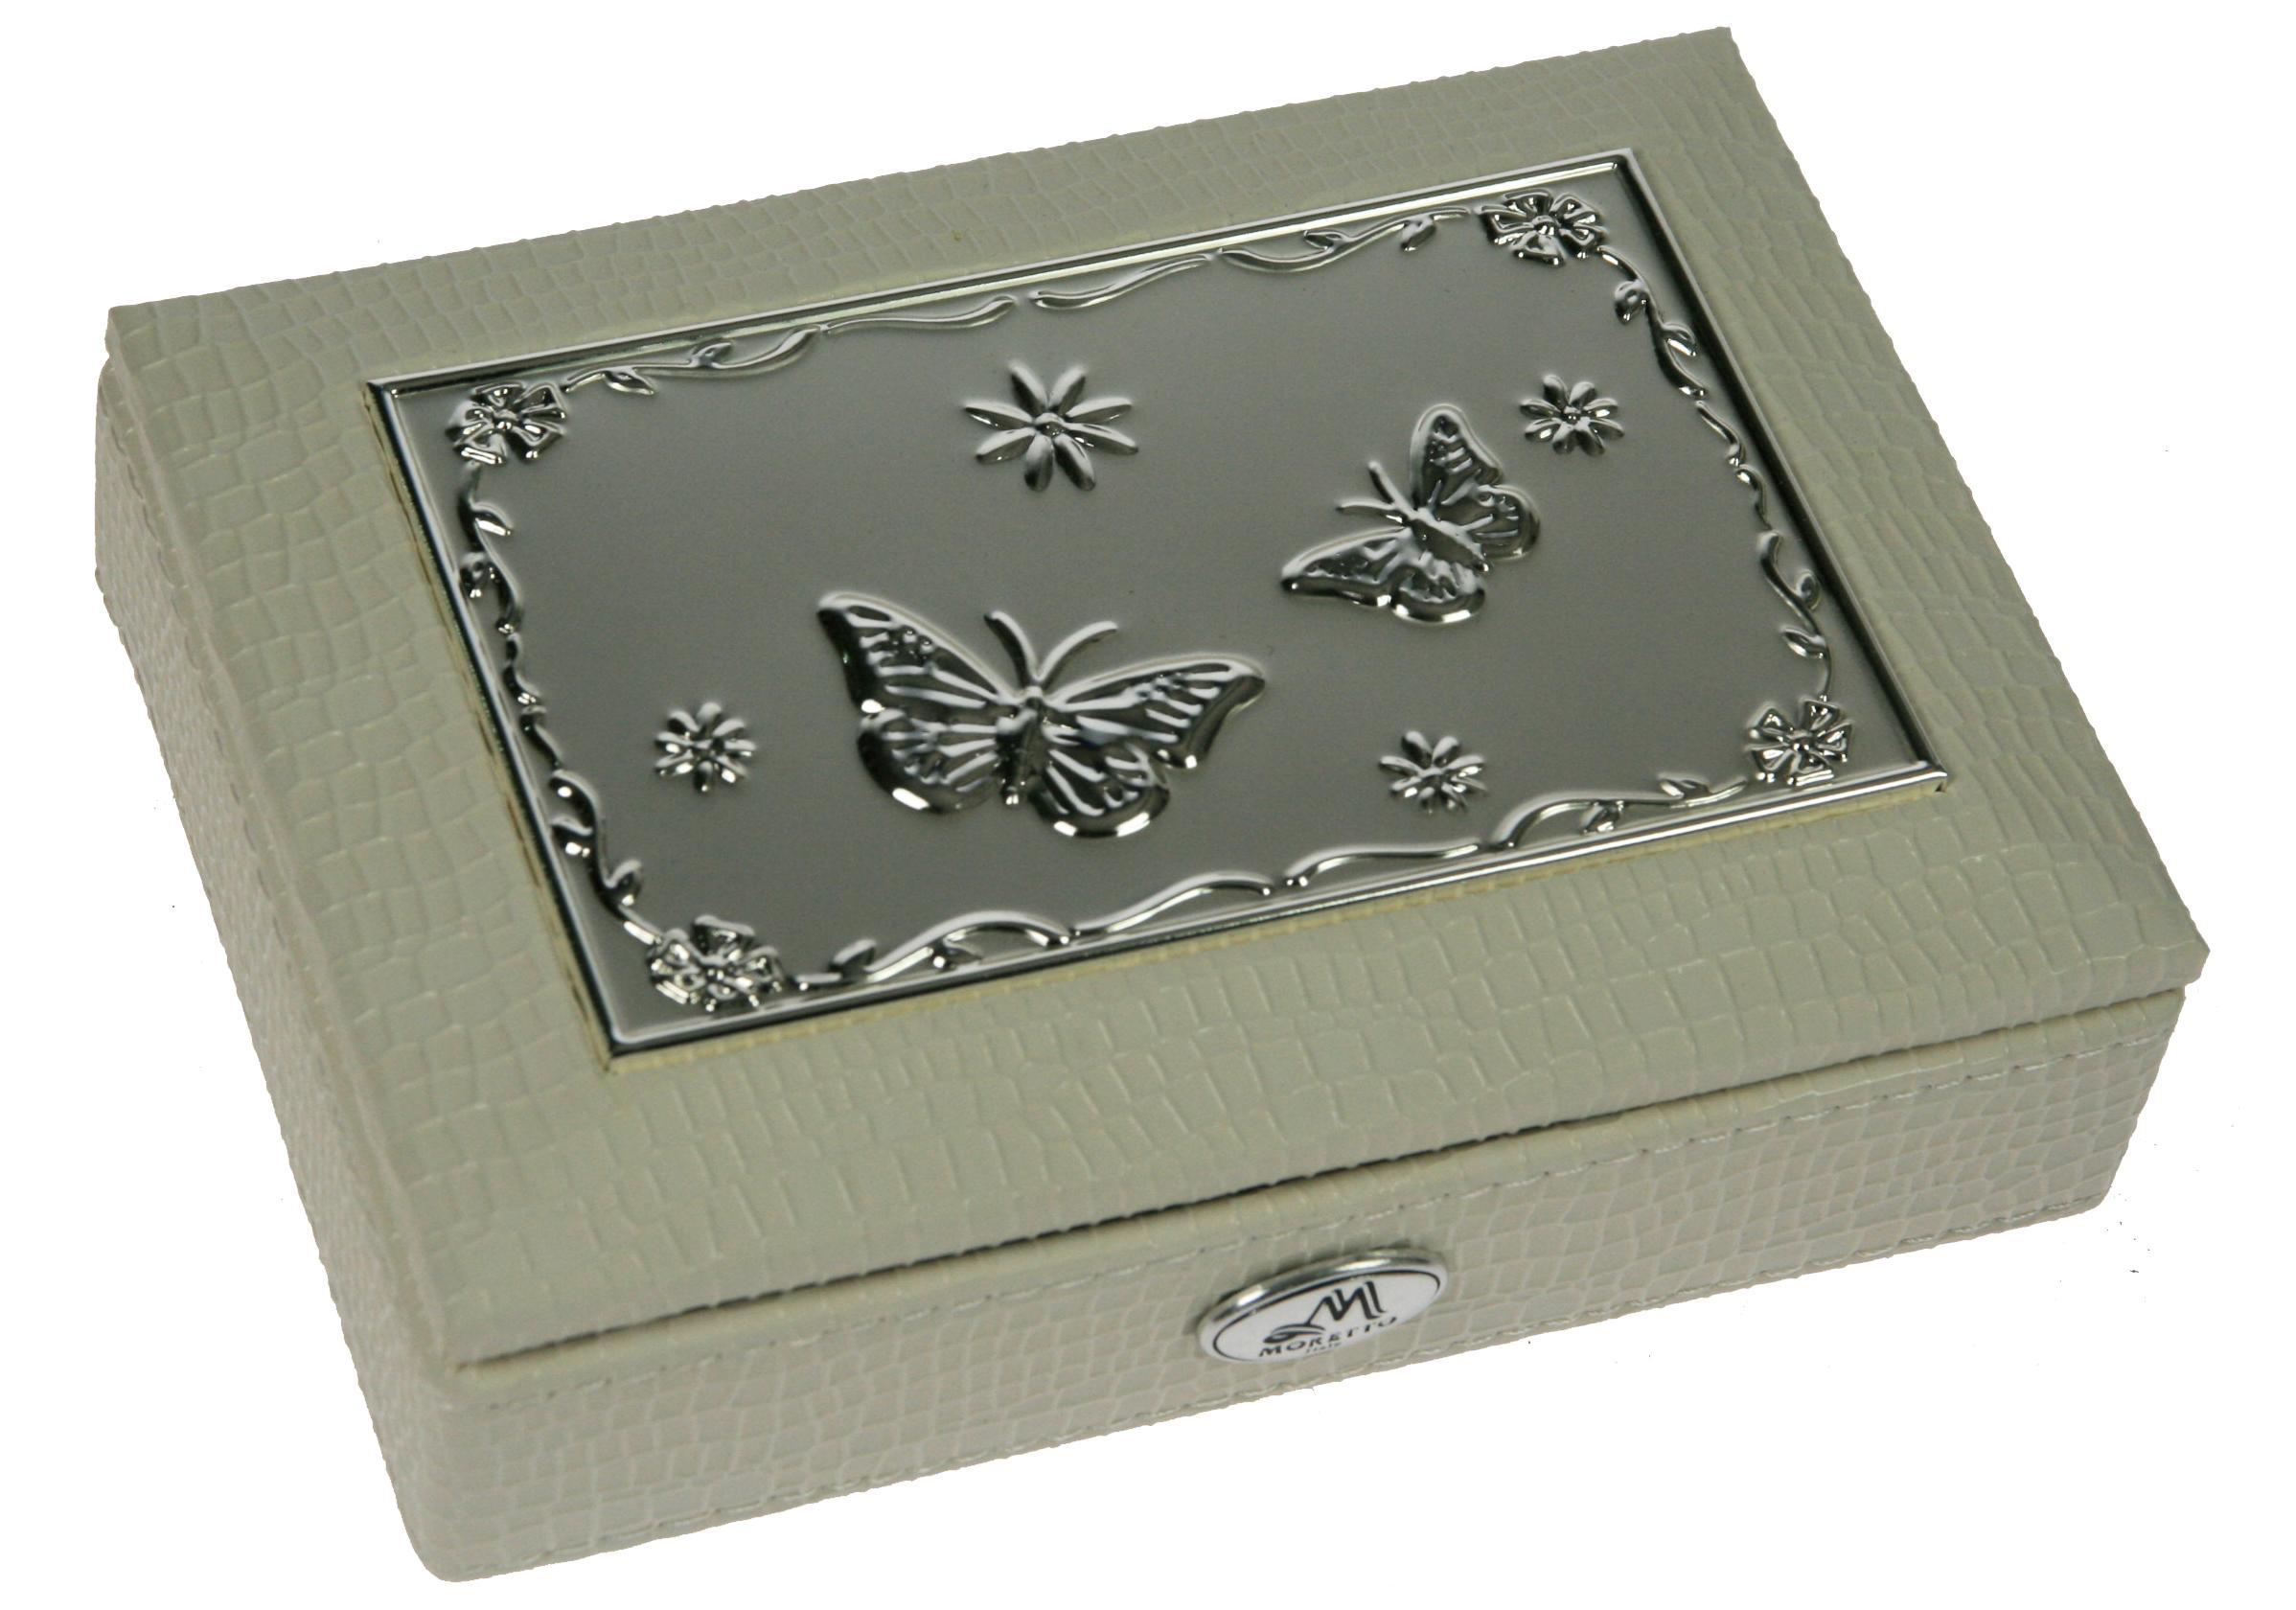 Шкатулка для ювелирных украшений Moretto, 18 х 13 х 5 см. 39945